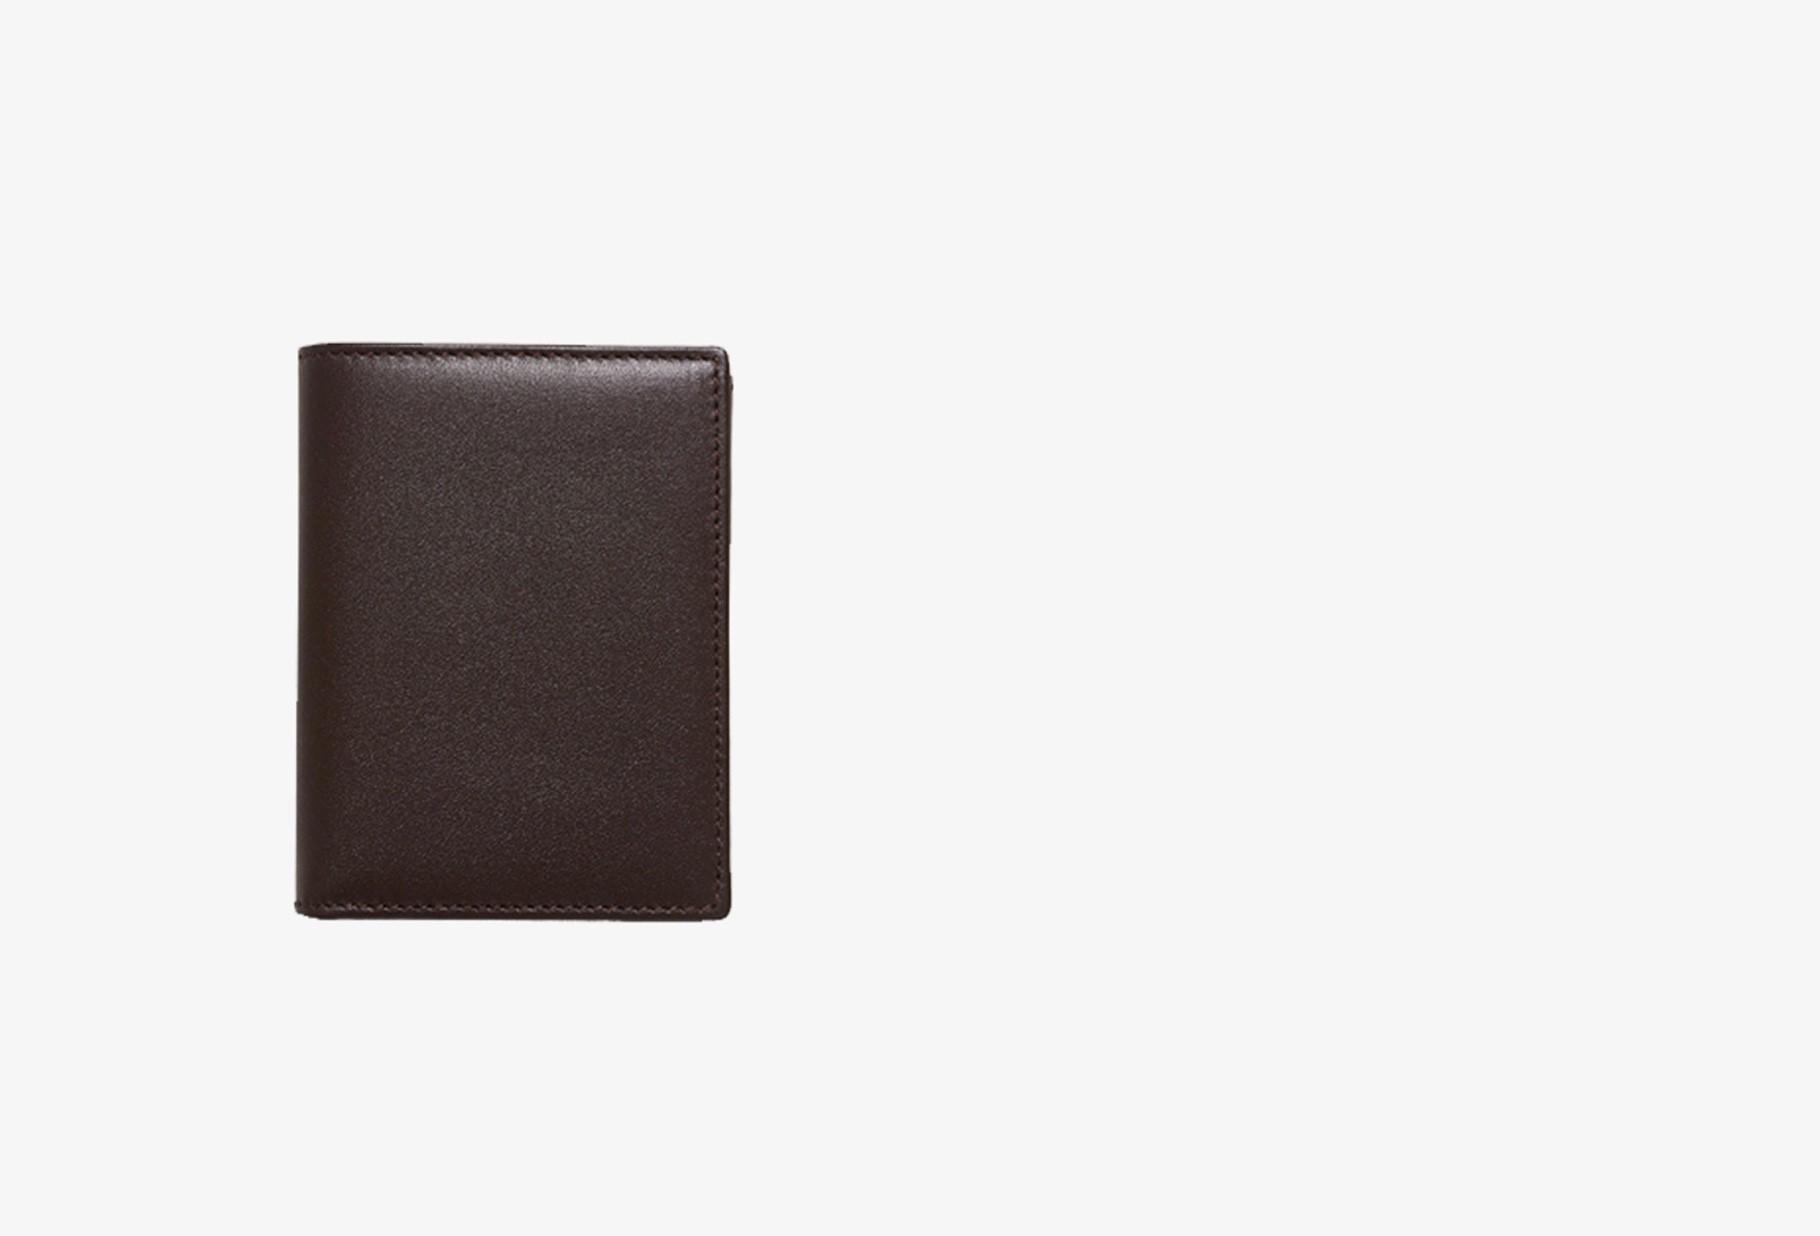 COMME DES GARÇONS WALLETS / Cdg leather wallet classic Sa0641 brown